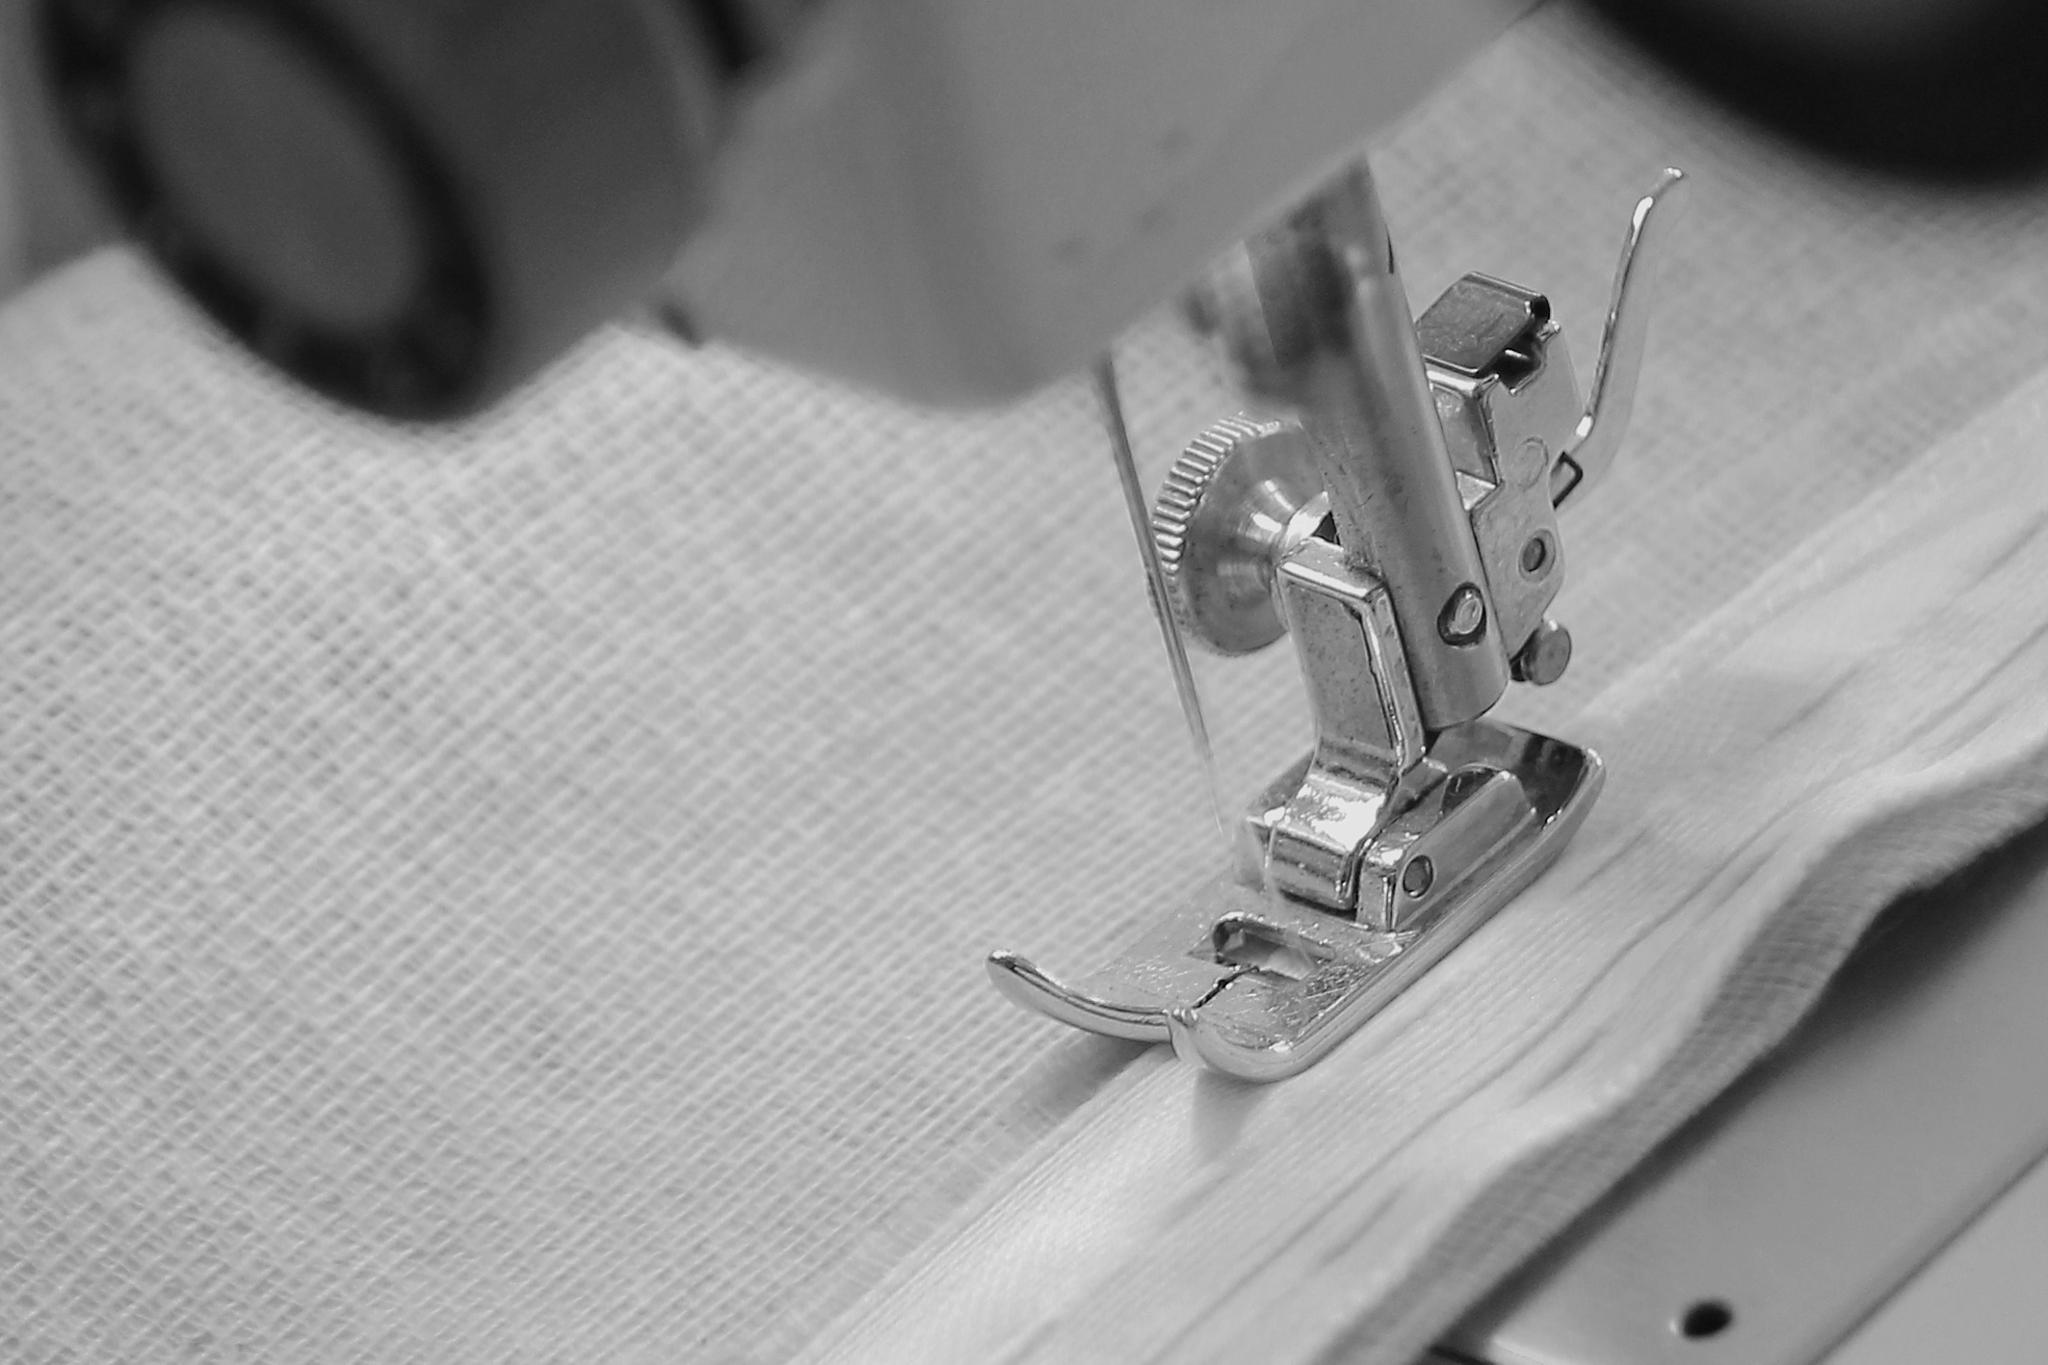 a stitch in time by David R Murphy